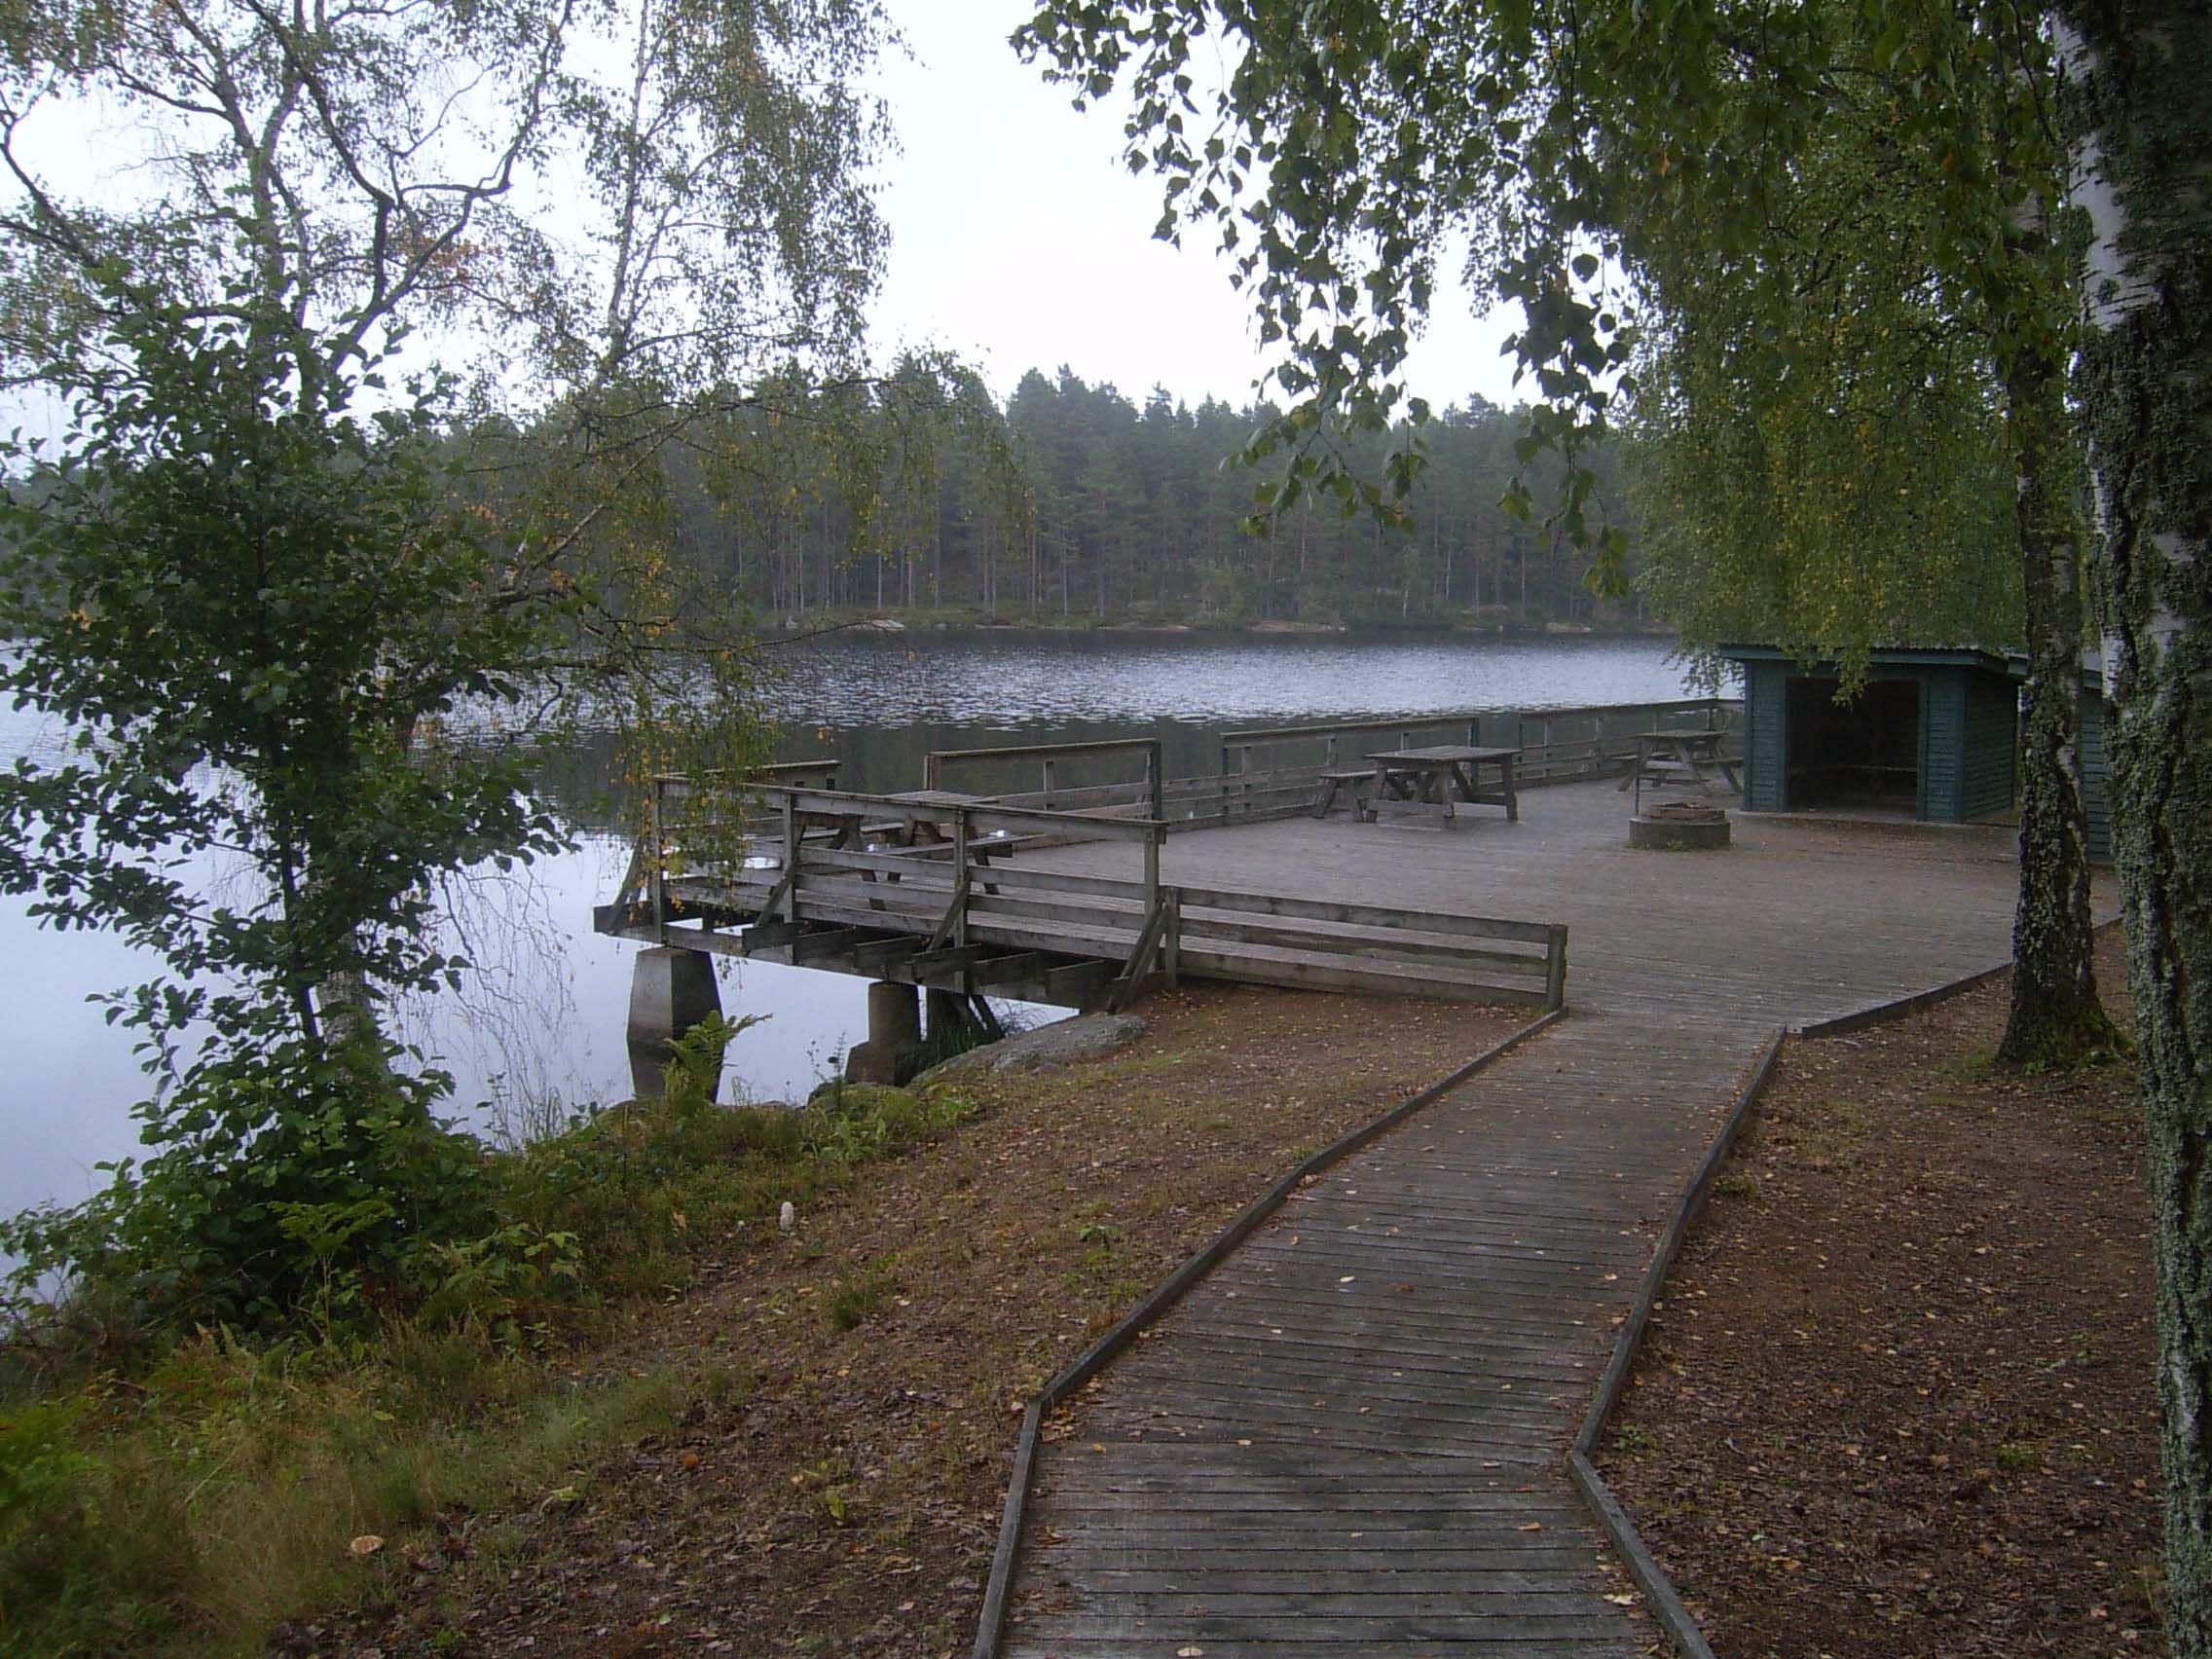 Stora Hammarsjön, Stora Hammarsjöområdet